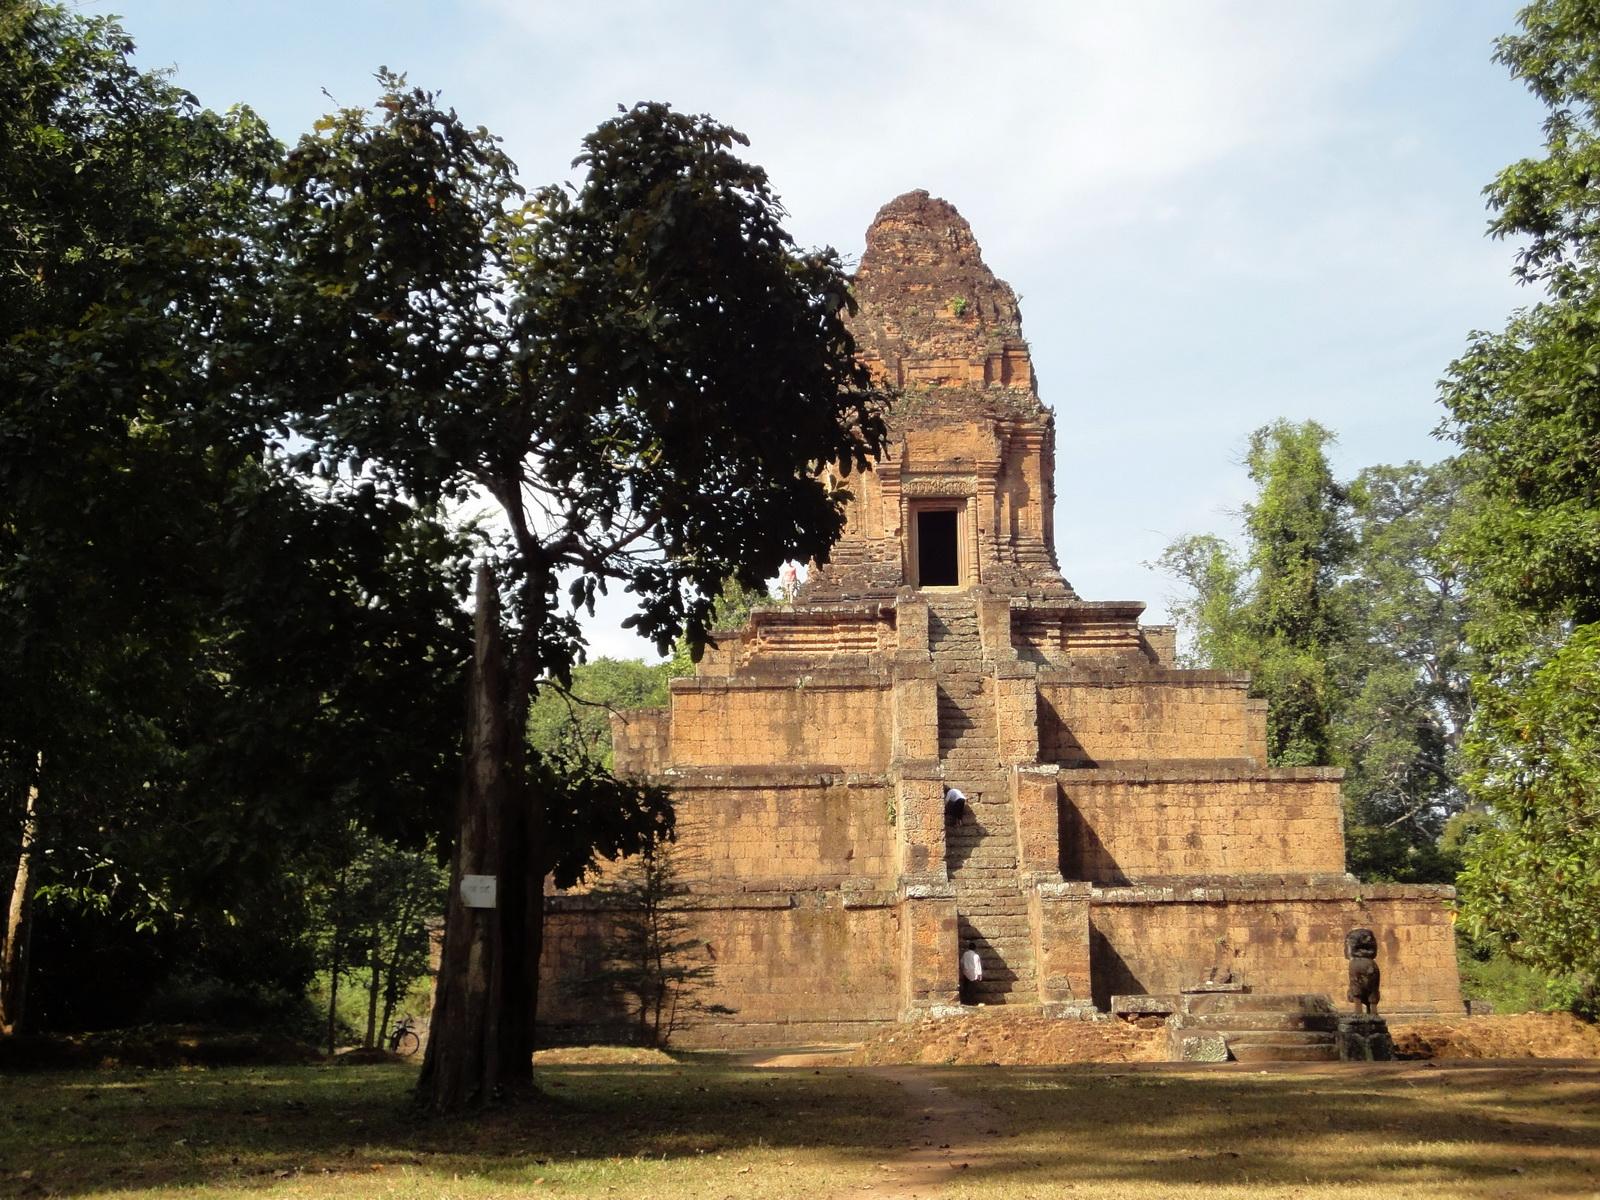 Baksei Chamkrong Temple Angkor Siem Reap Cambodia Jan 2010 08